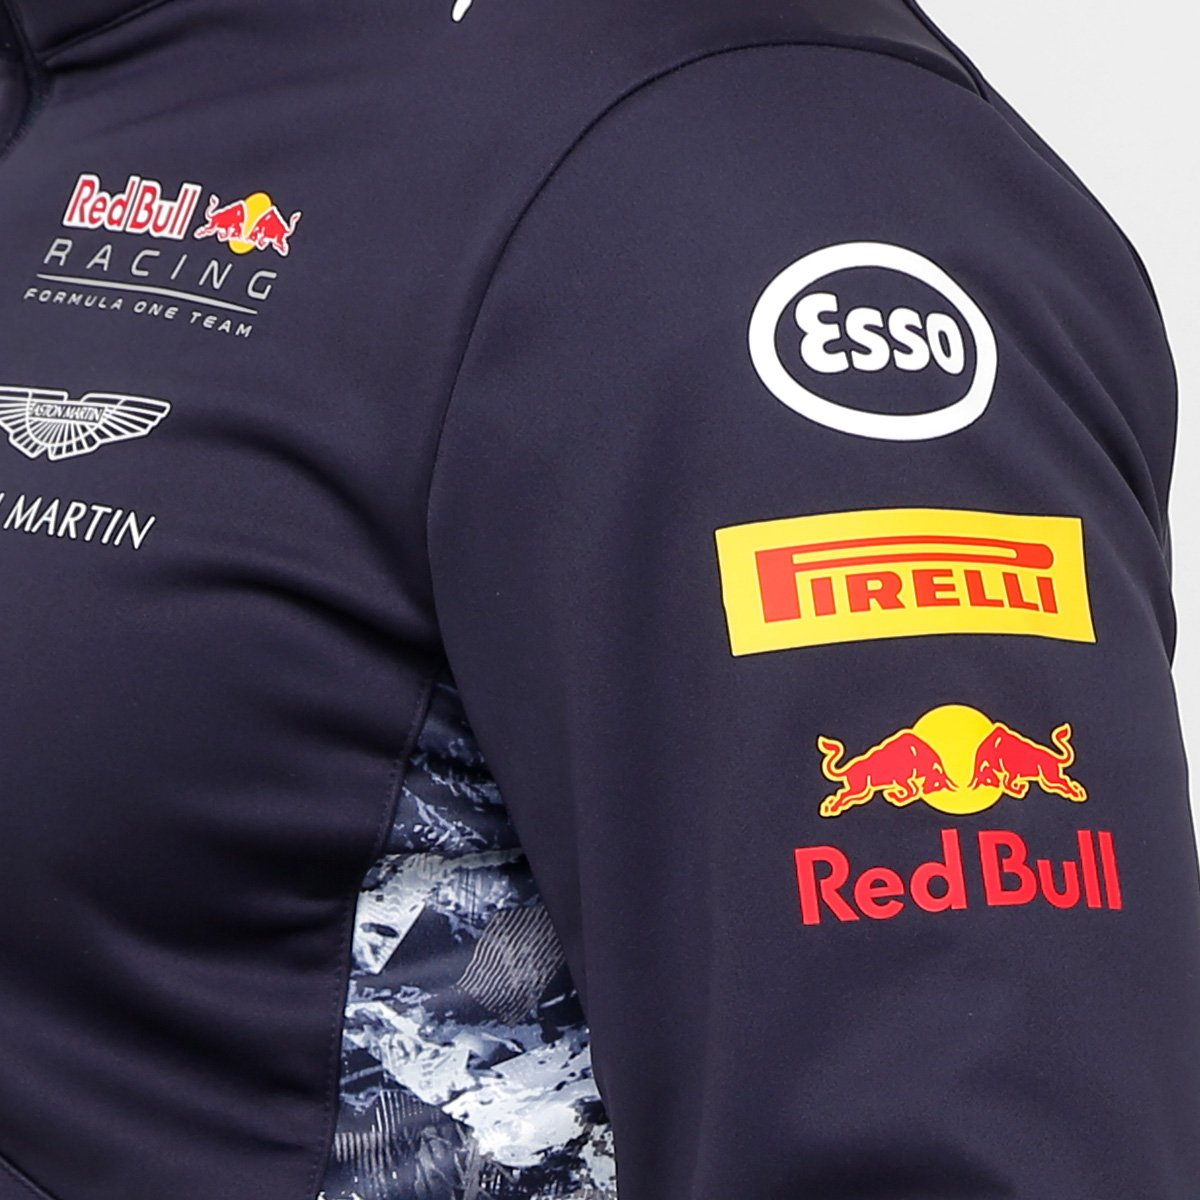 Jaqueta Puma Red Bull Team Softshell Masculina - Compre Agora  76d30e3d4bd